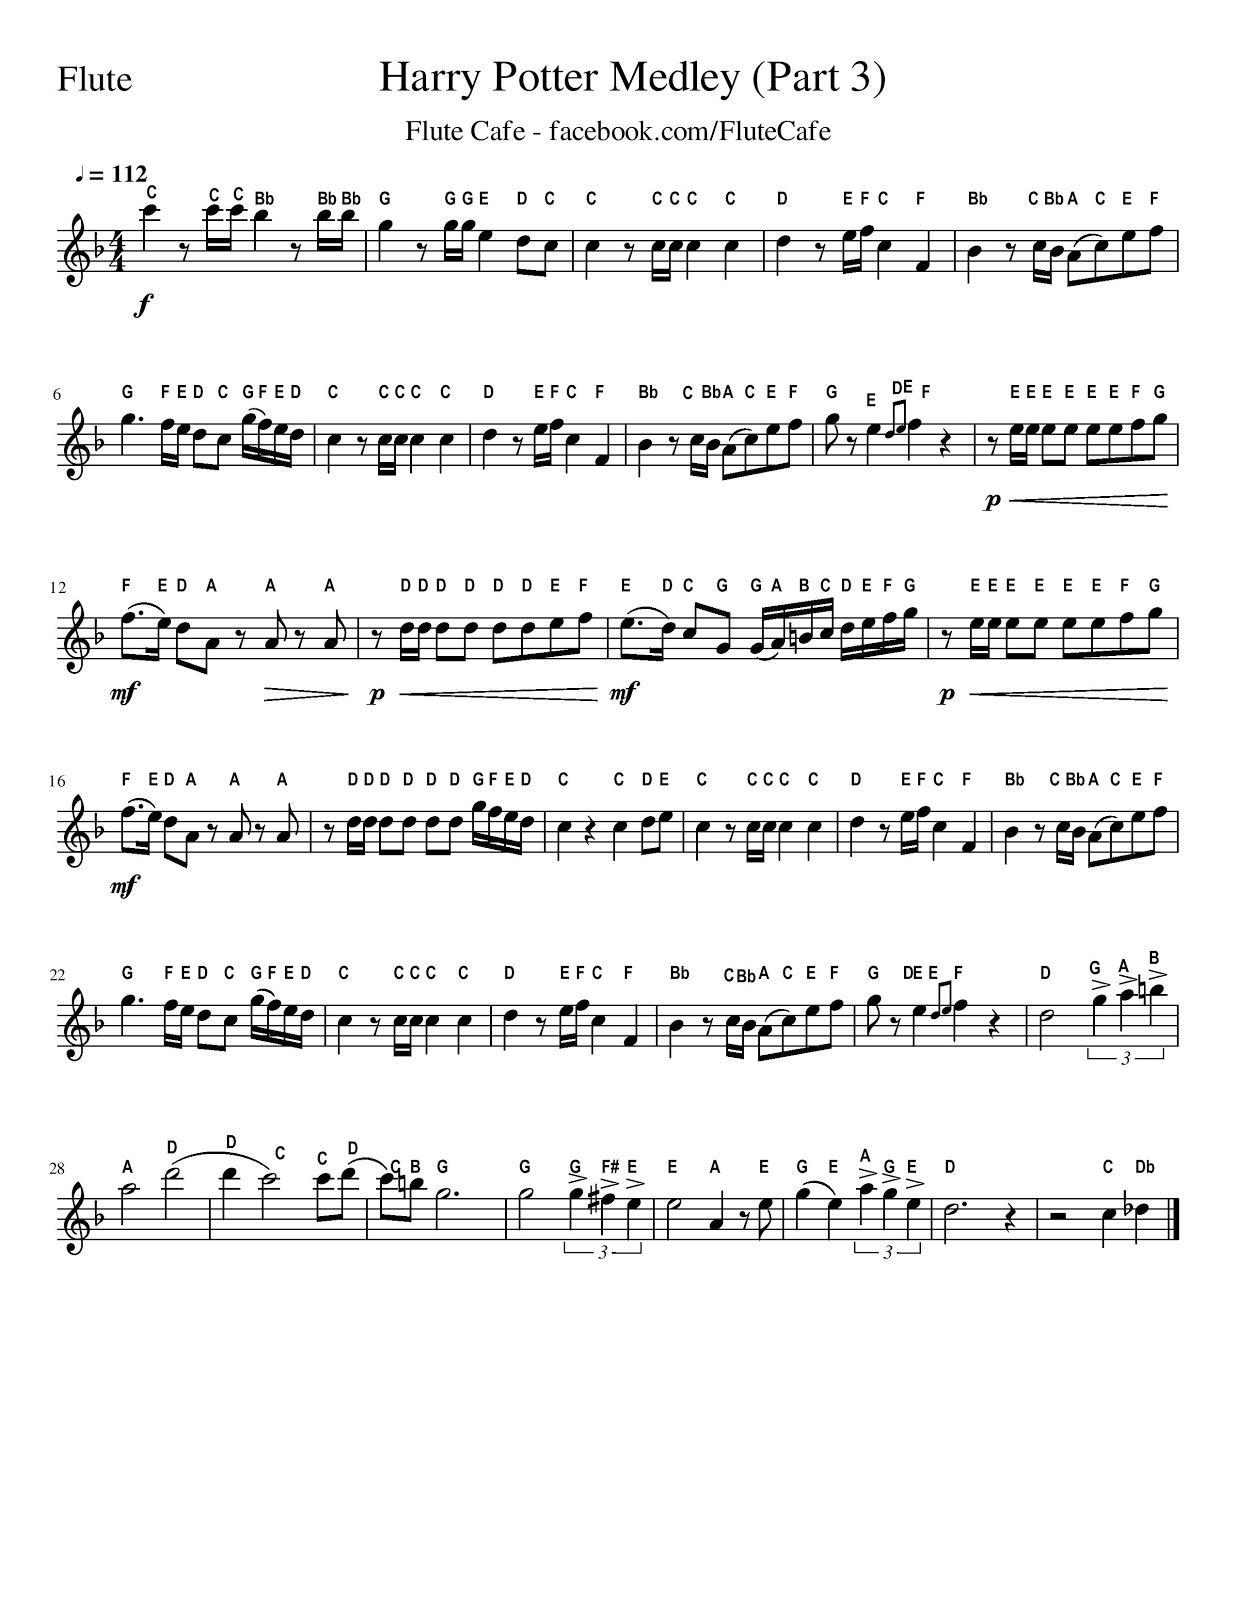 frozen flute sheet music pdf